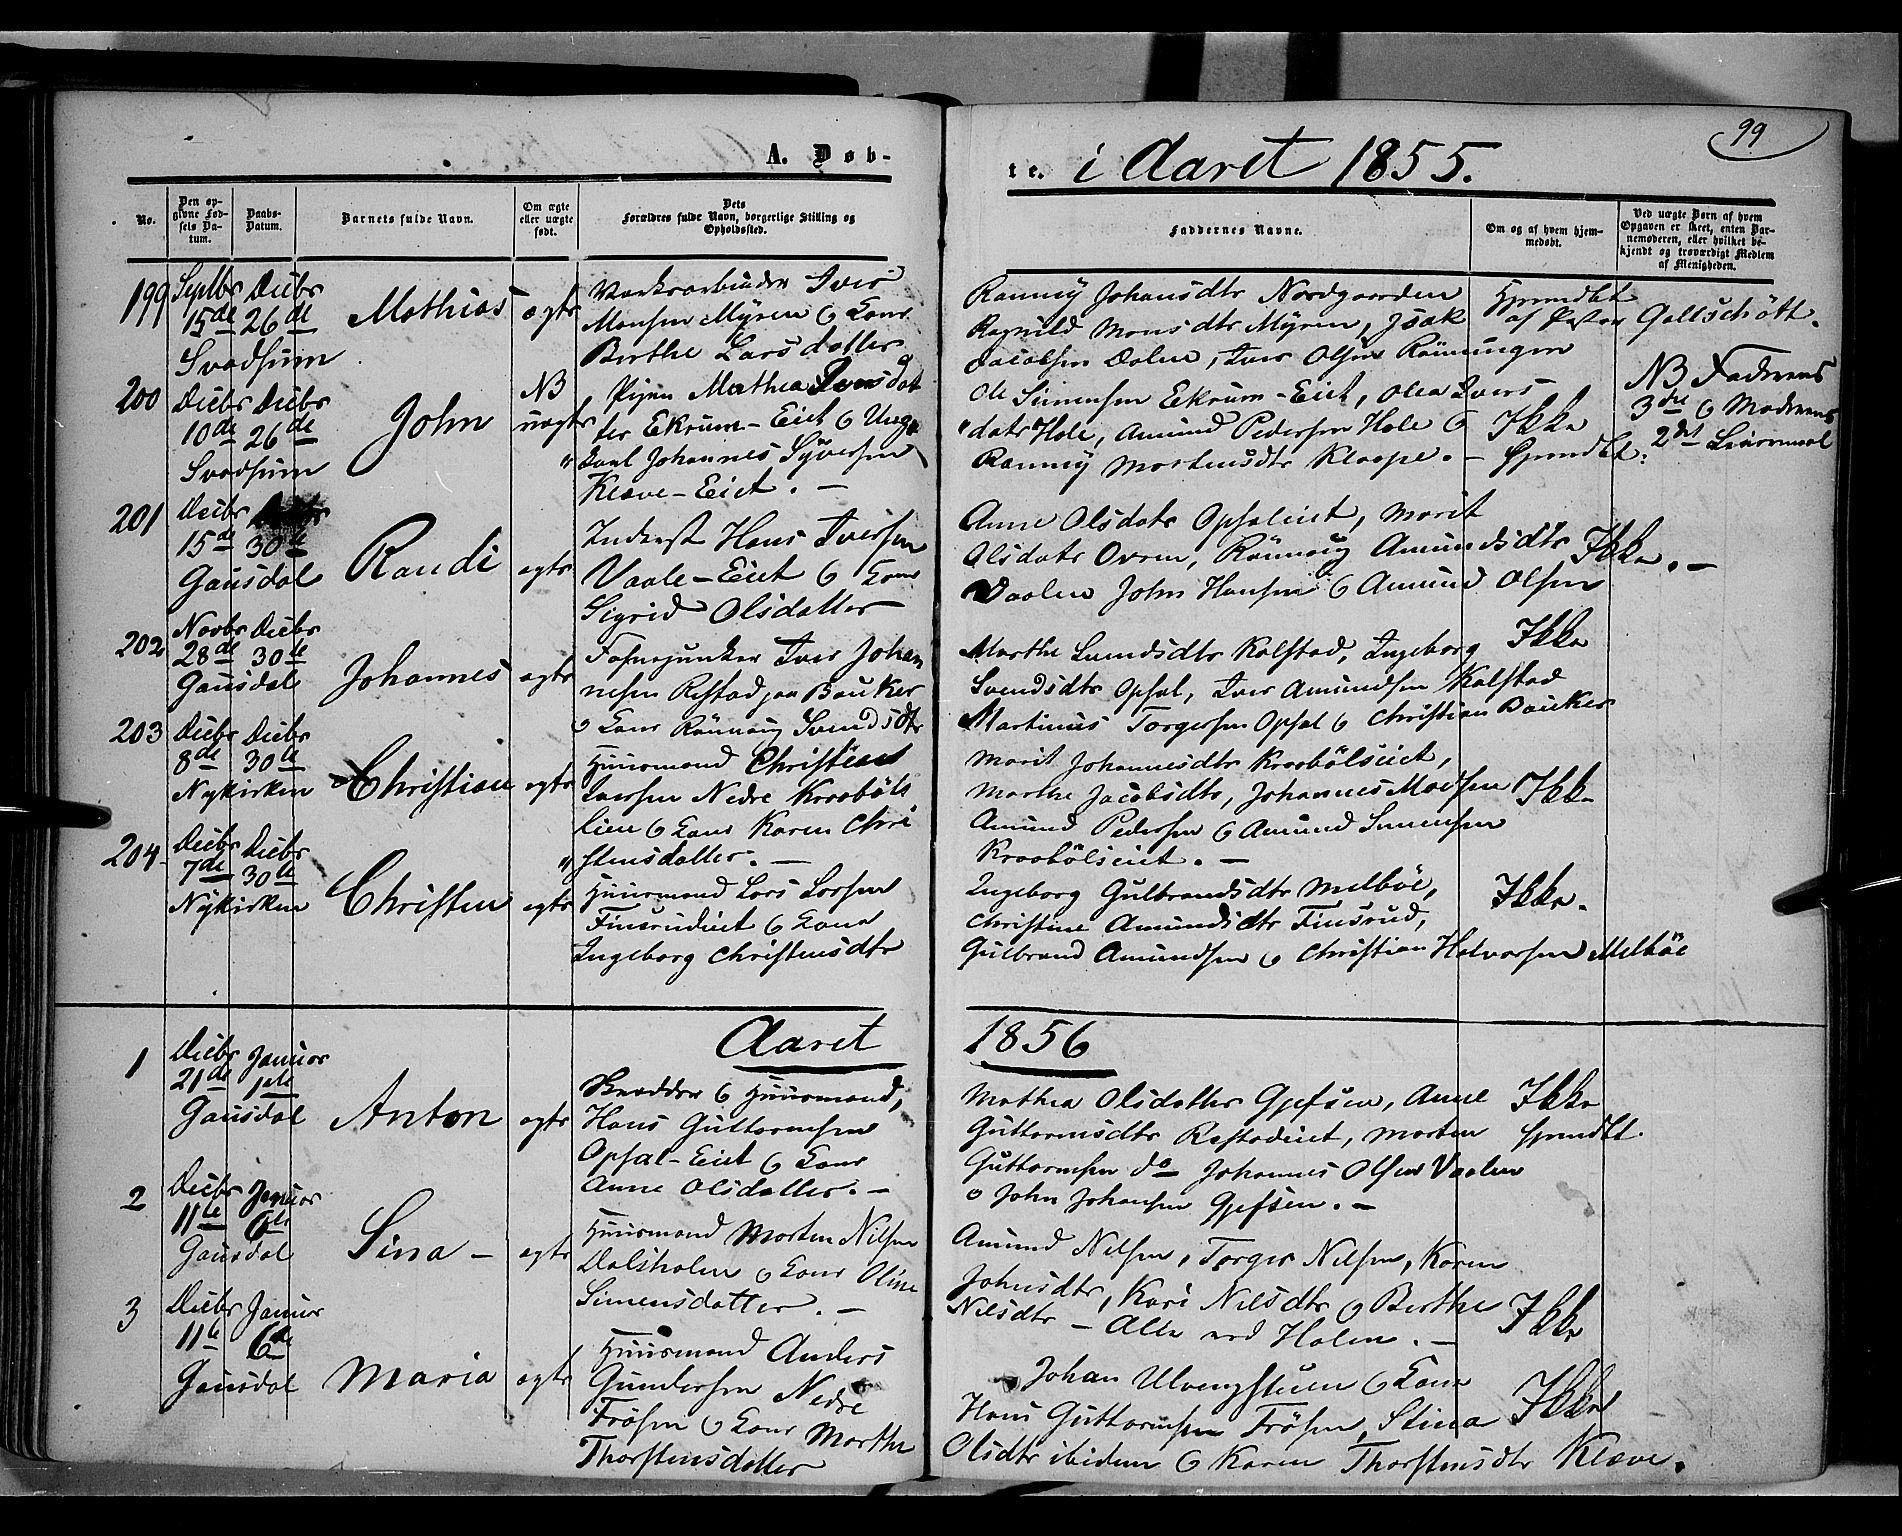 SAH, Gausdal prestekontor, Ministerialbok nr. 8, 1850-1861, s. 99